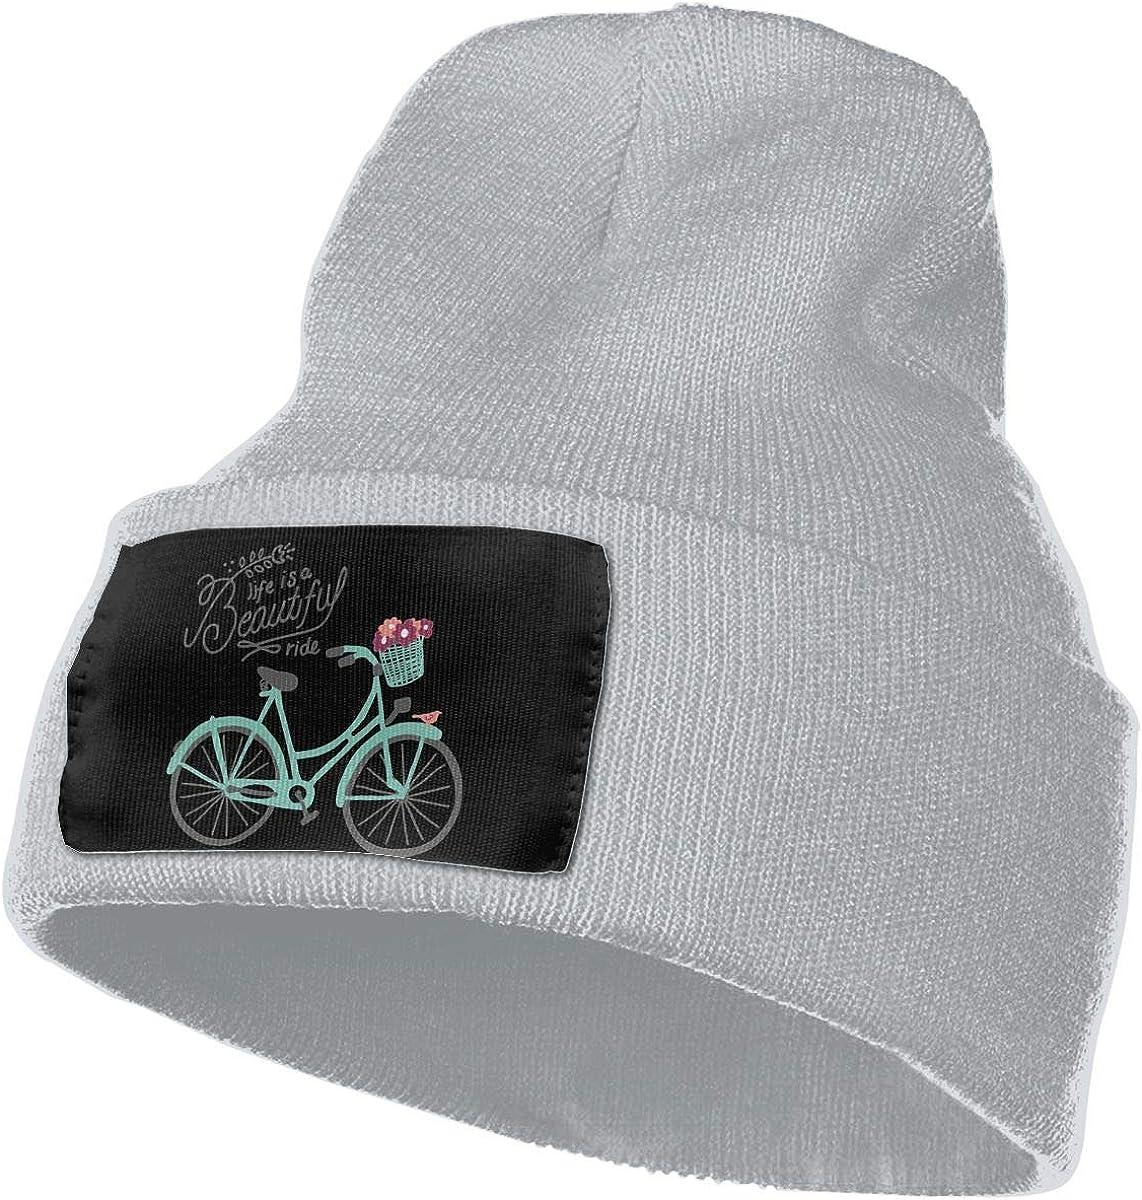 Life is A Beautiful Ride Warm Winter Hat Knit Beanie Skull Cap Cuff Beanie Hat Winter Hats for Men /& Women